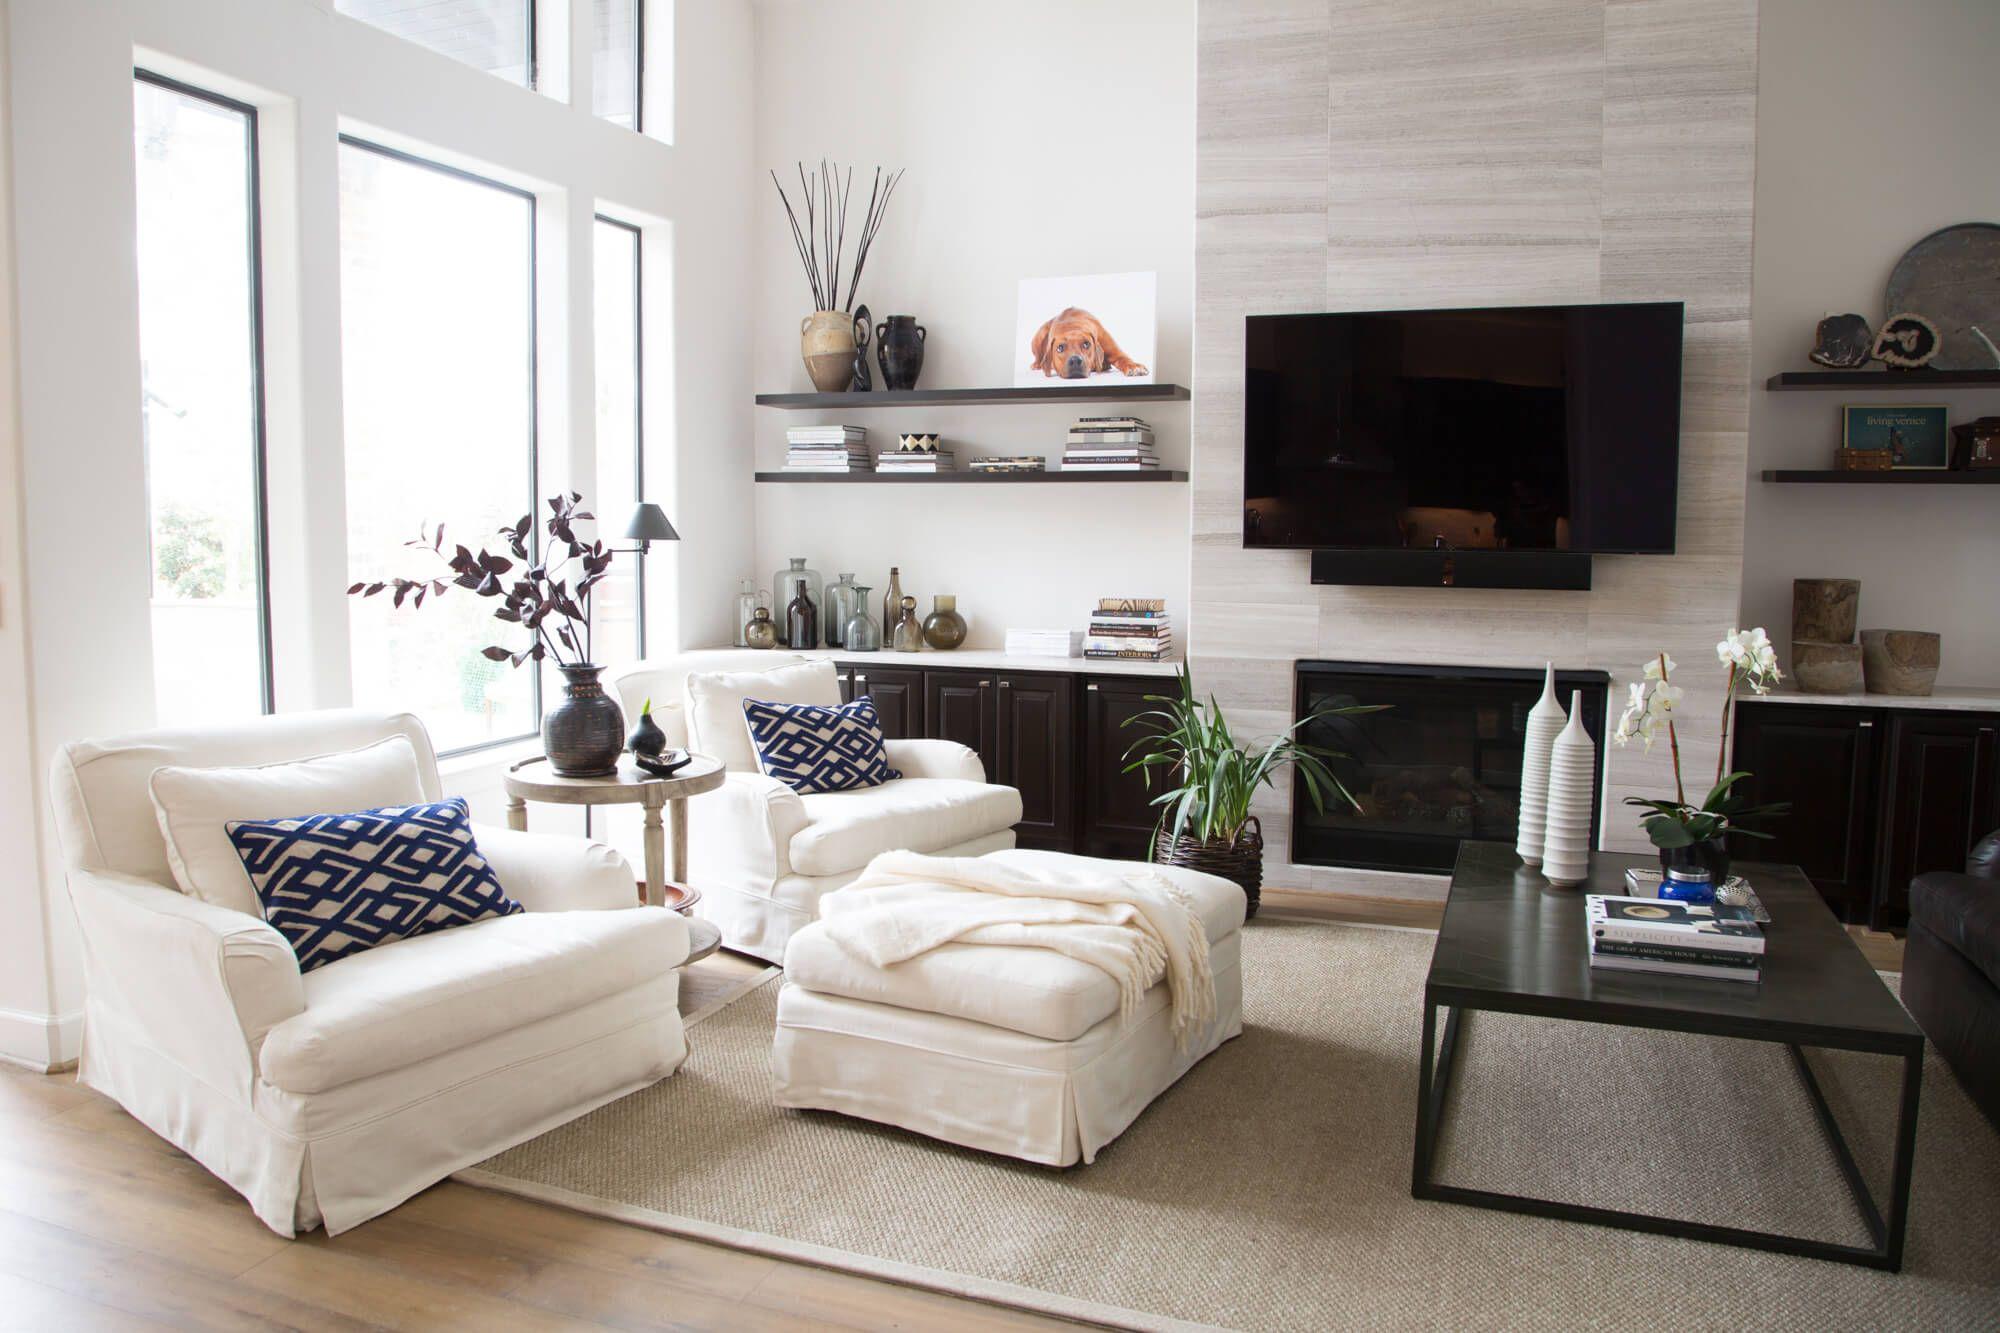 Remodel - new fireplace, flooring, floating shelves | Fabulous ...